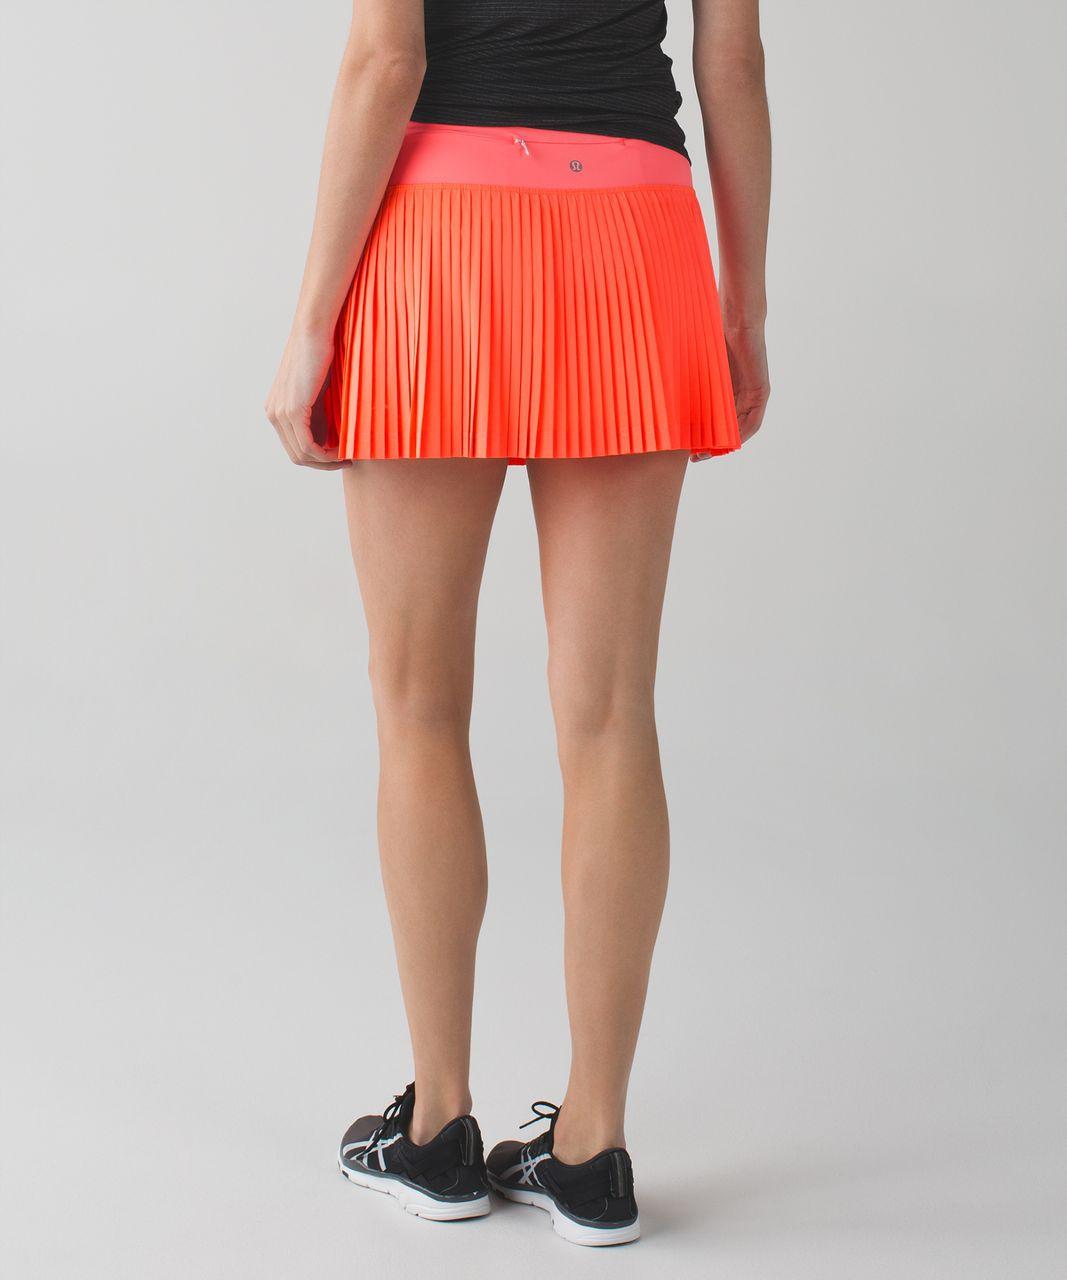 7e28c1f325 Lululemon Pleat To Street Skirt II - Grapefruit - lulu fanatics